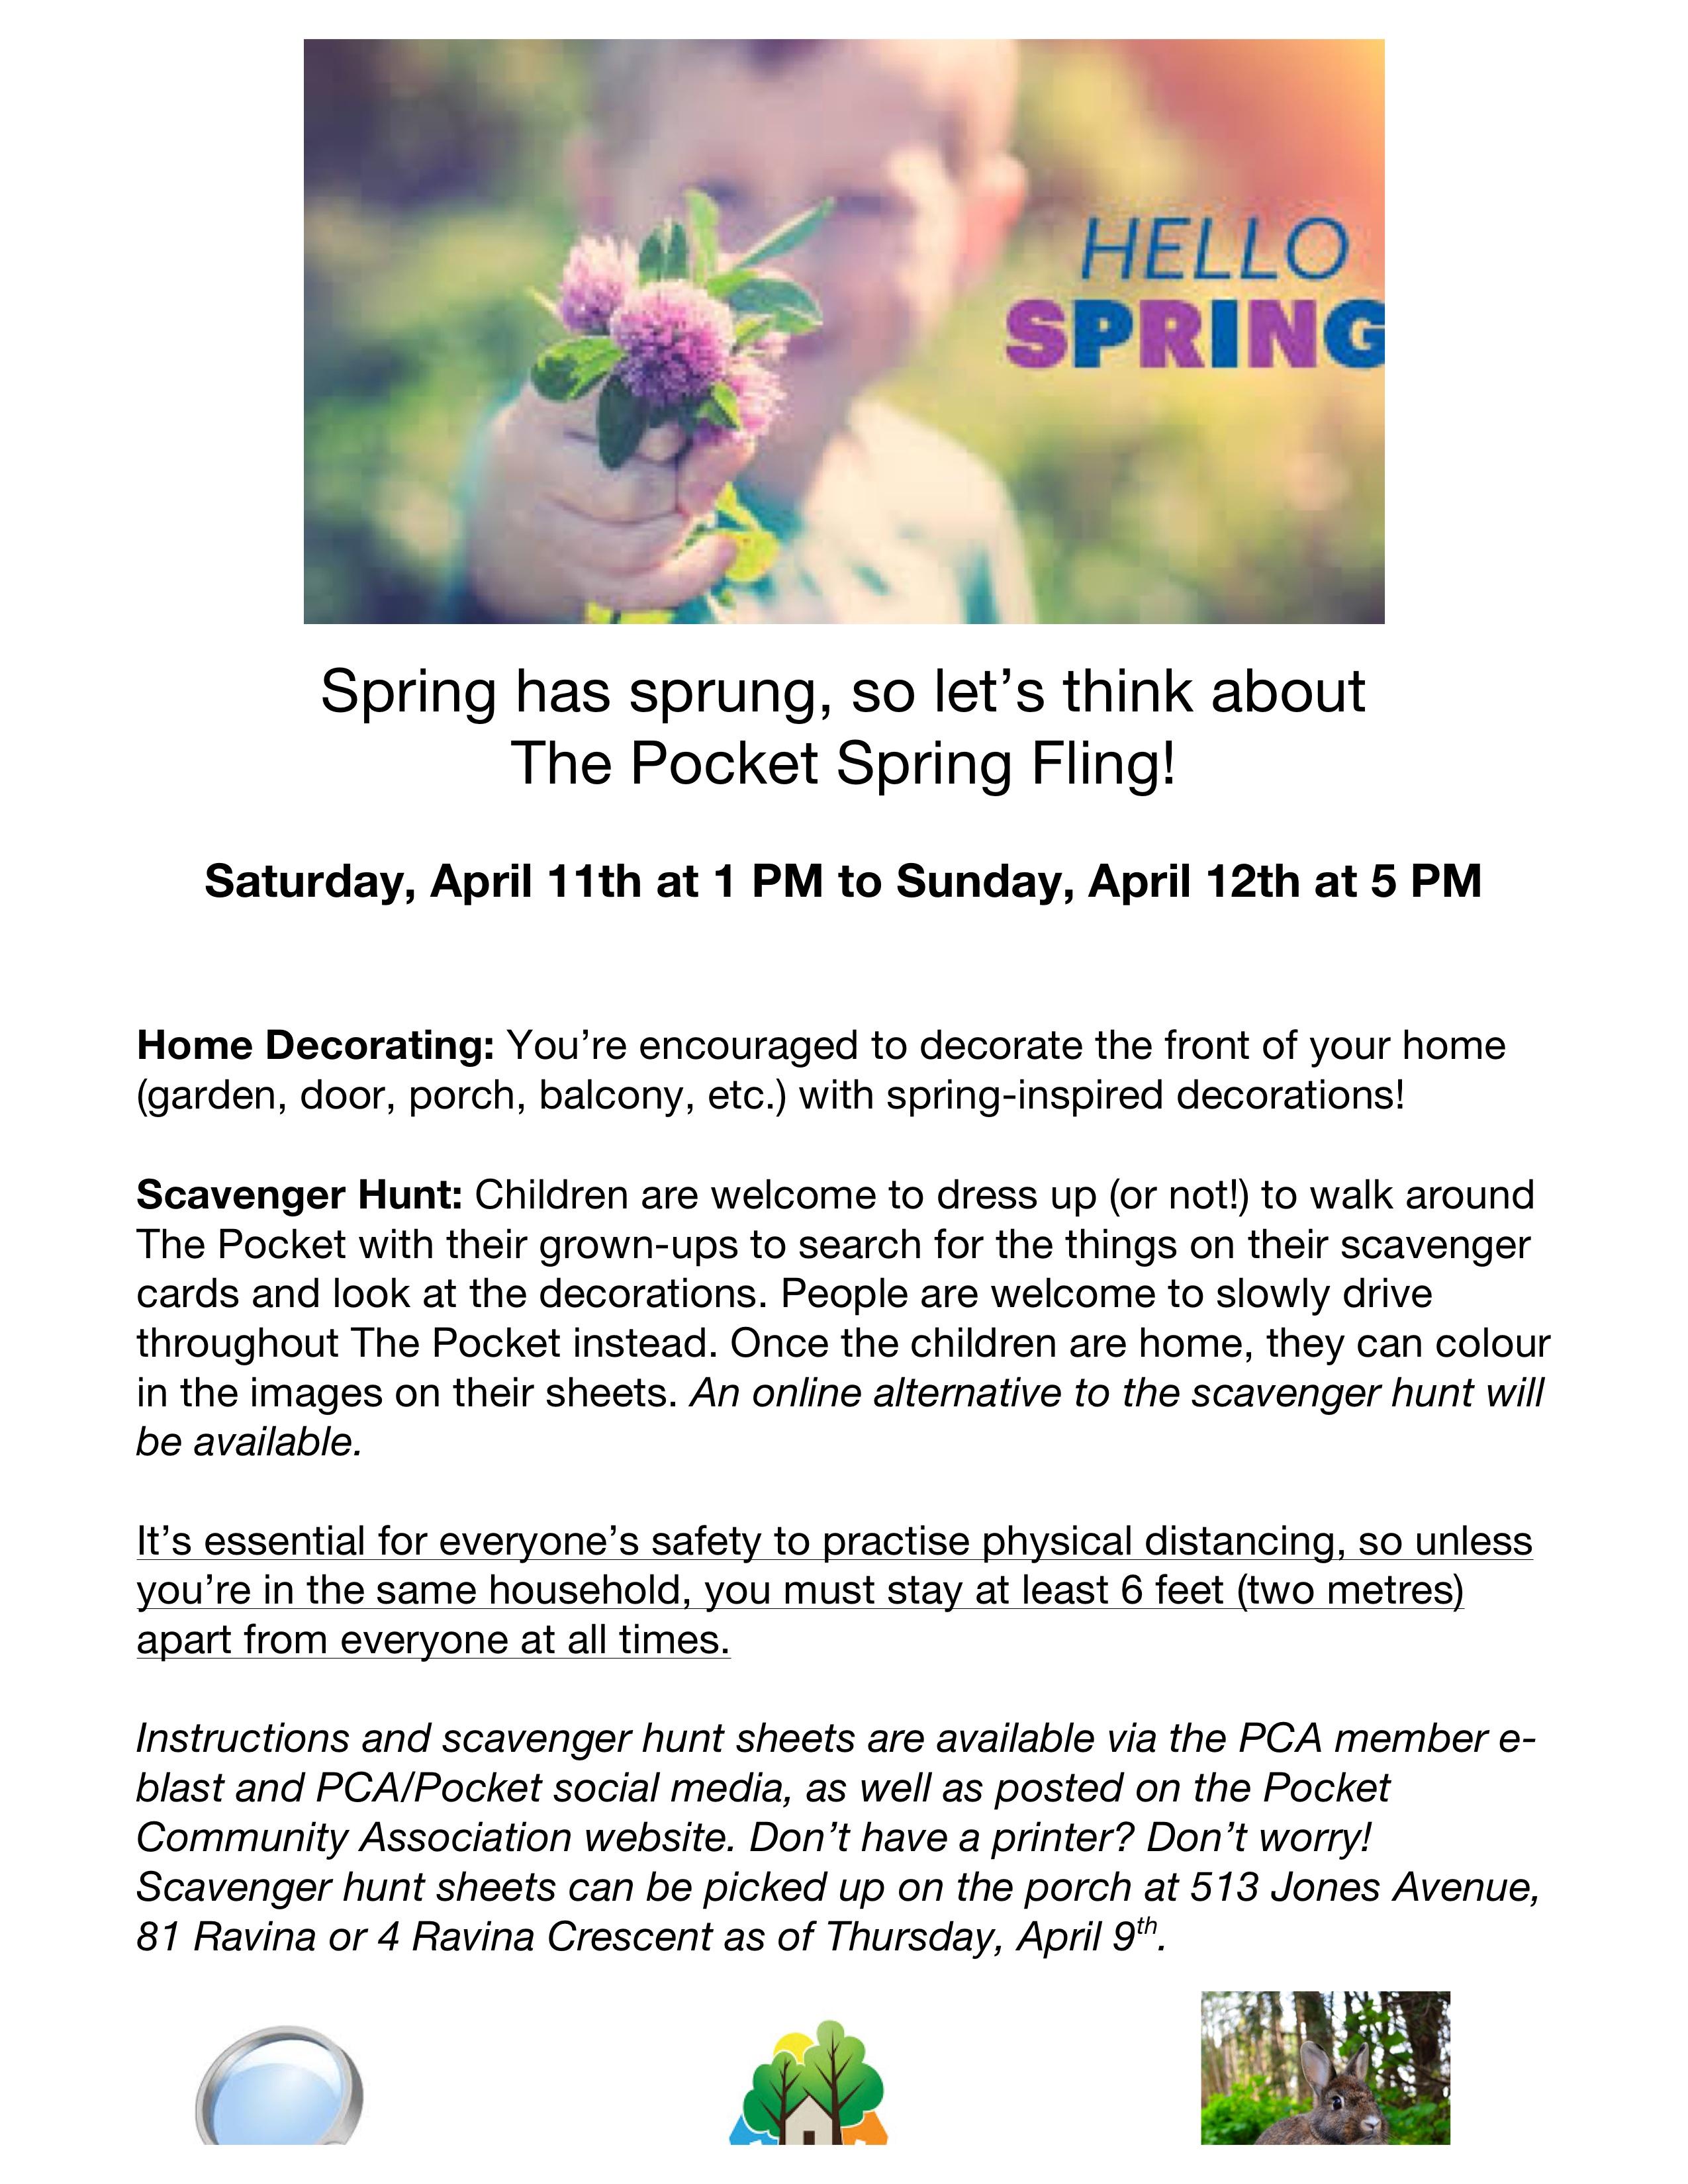 SpringFlingPosterFINALjpeg